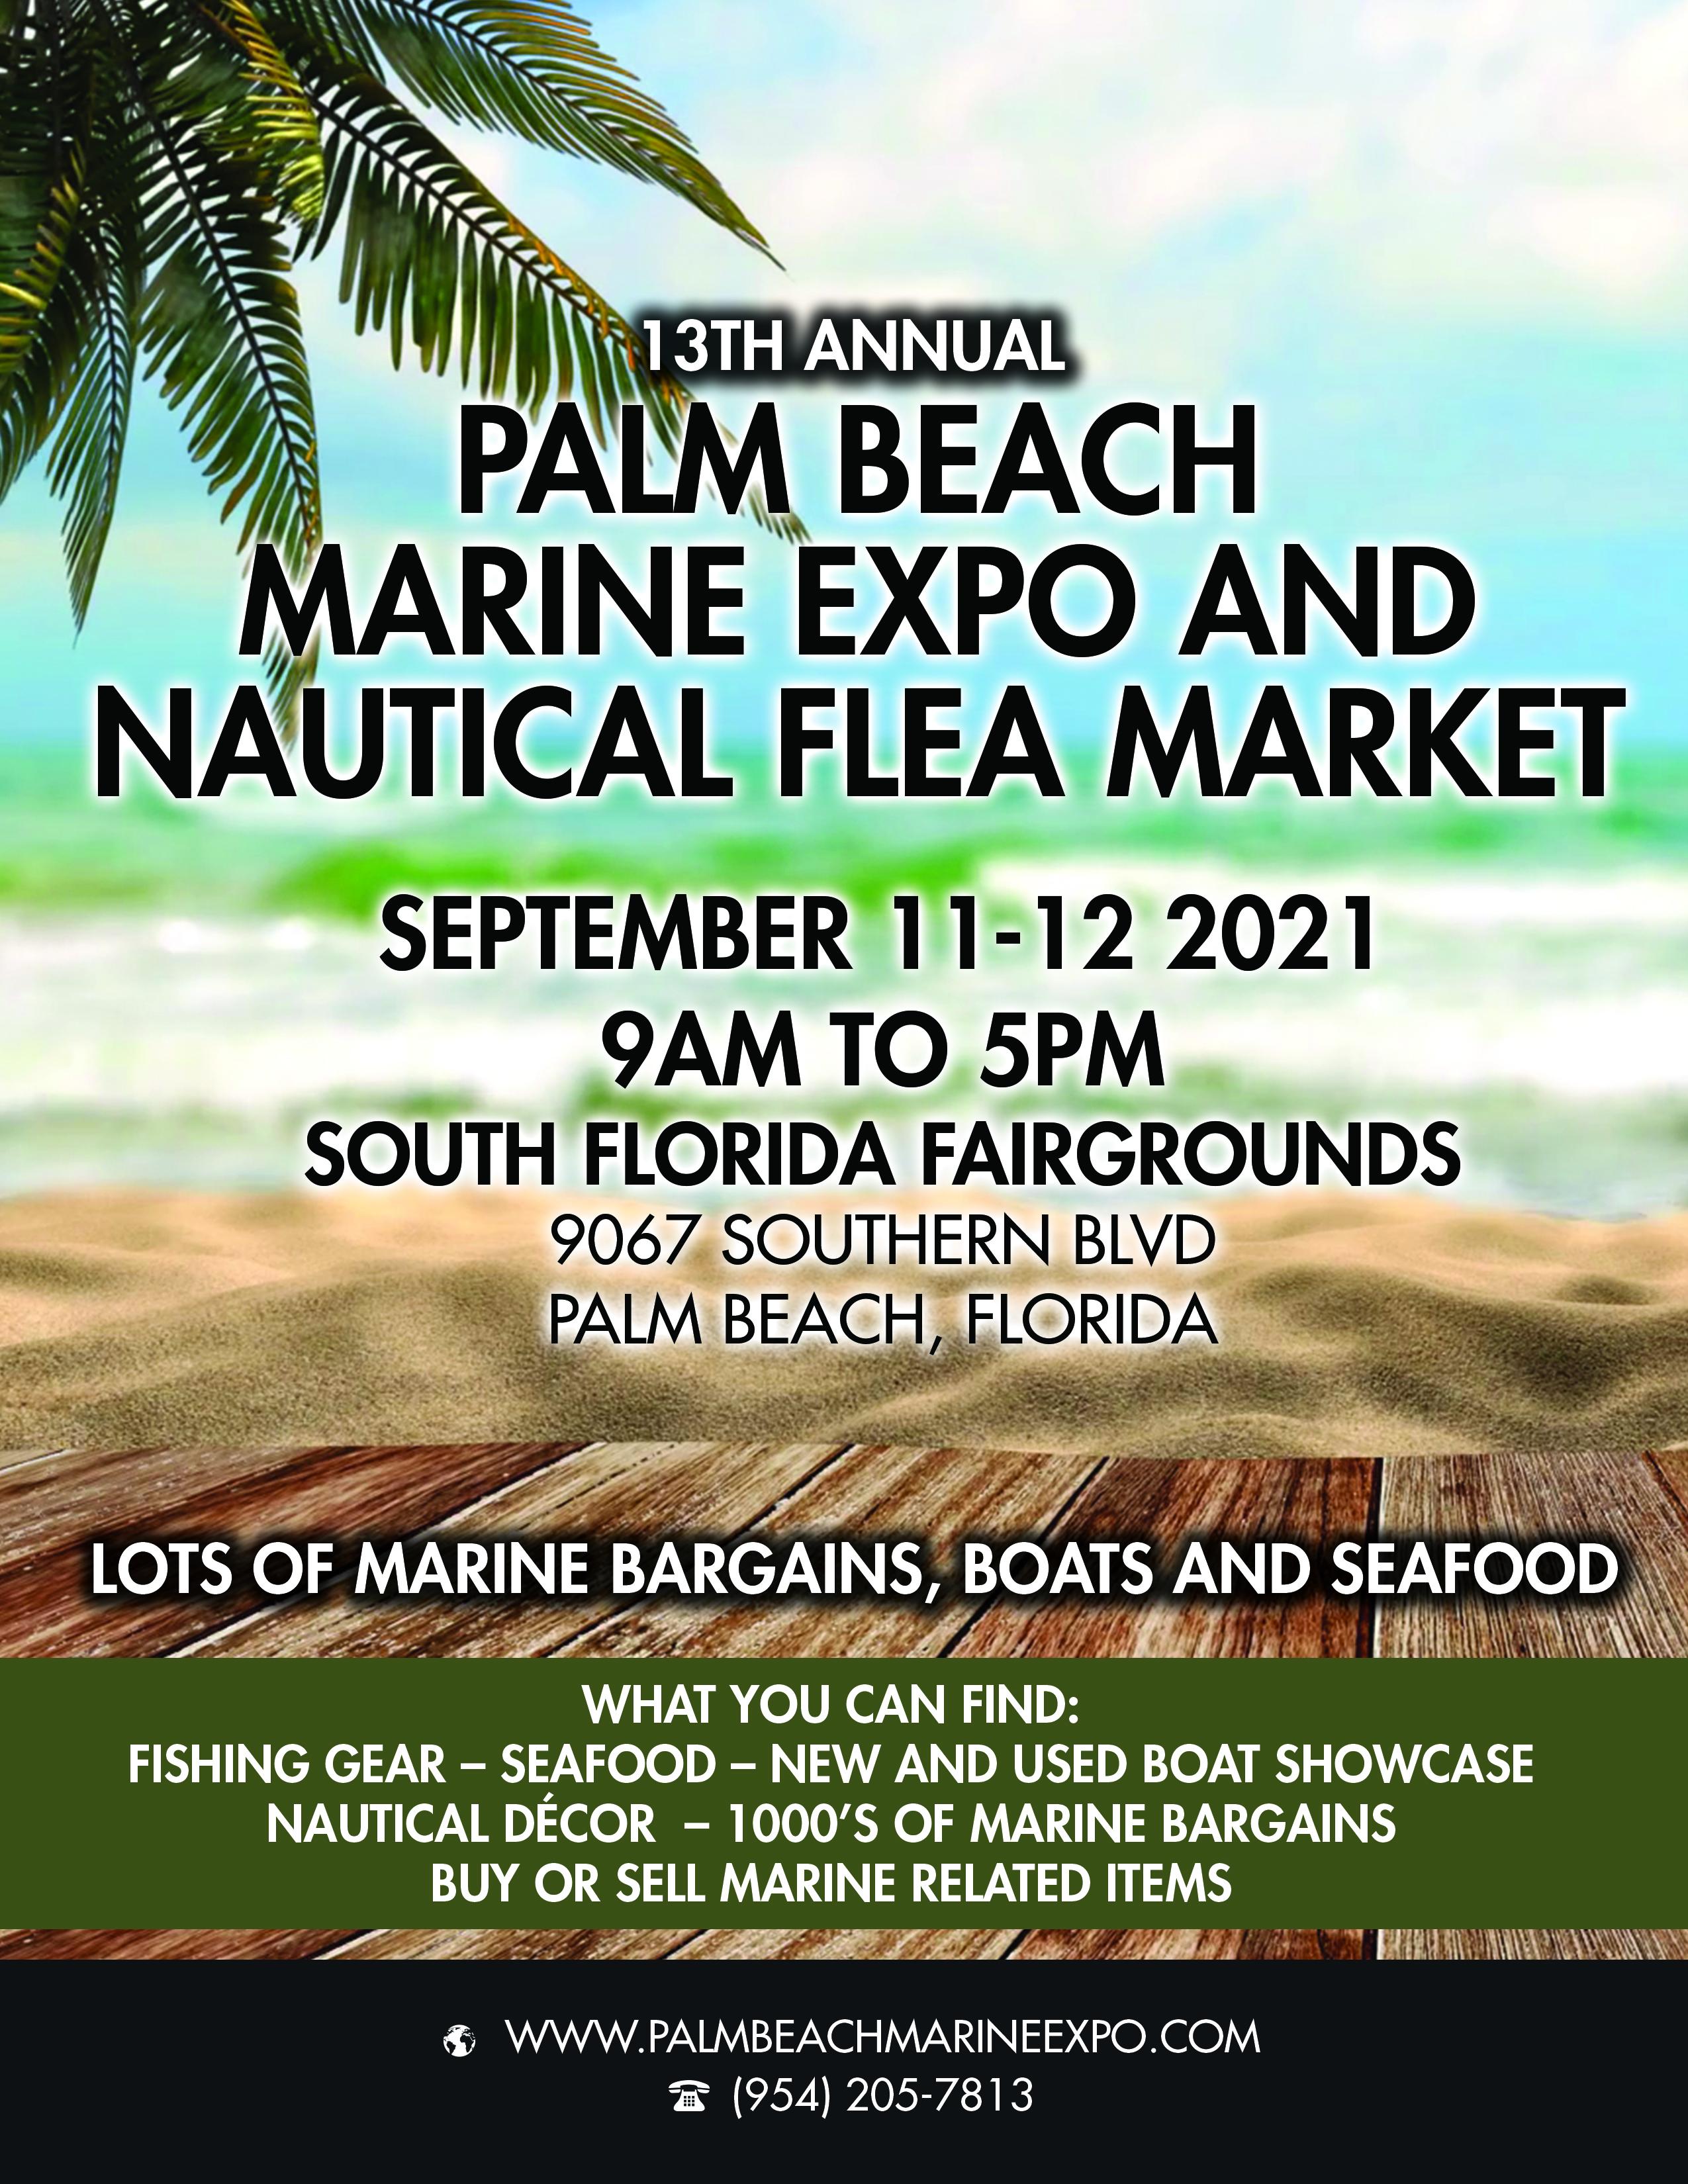 13th Annual Palm Beach Marine Expo and Nautical Flea Market Beckons